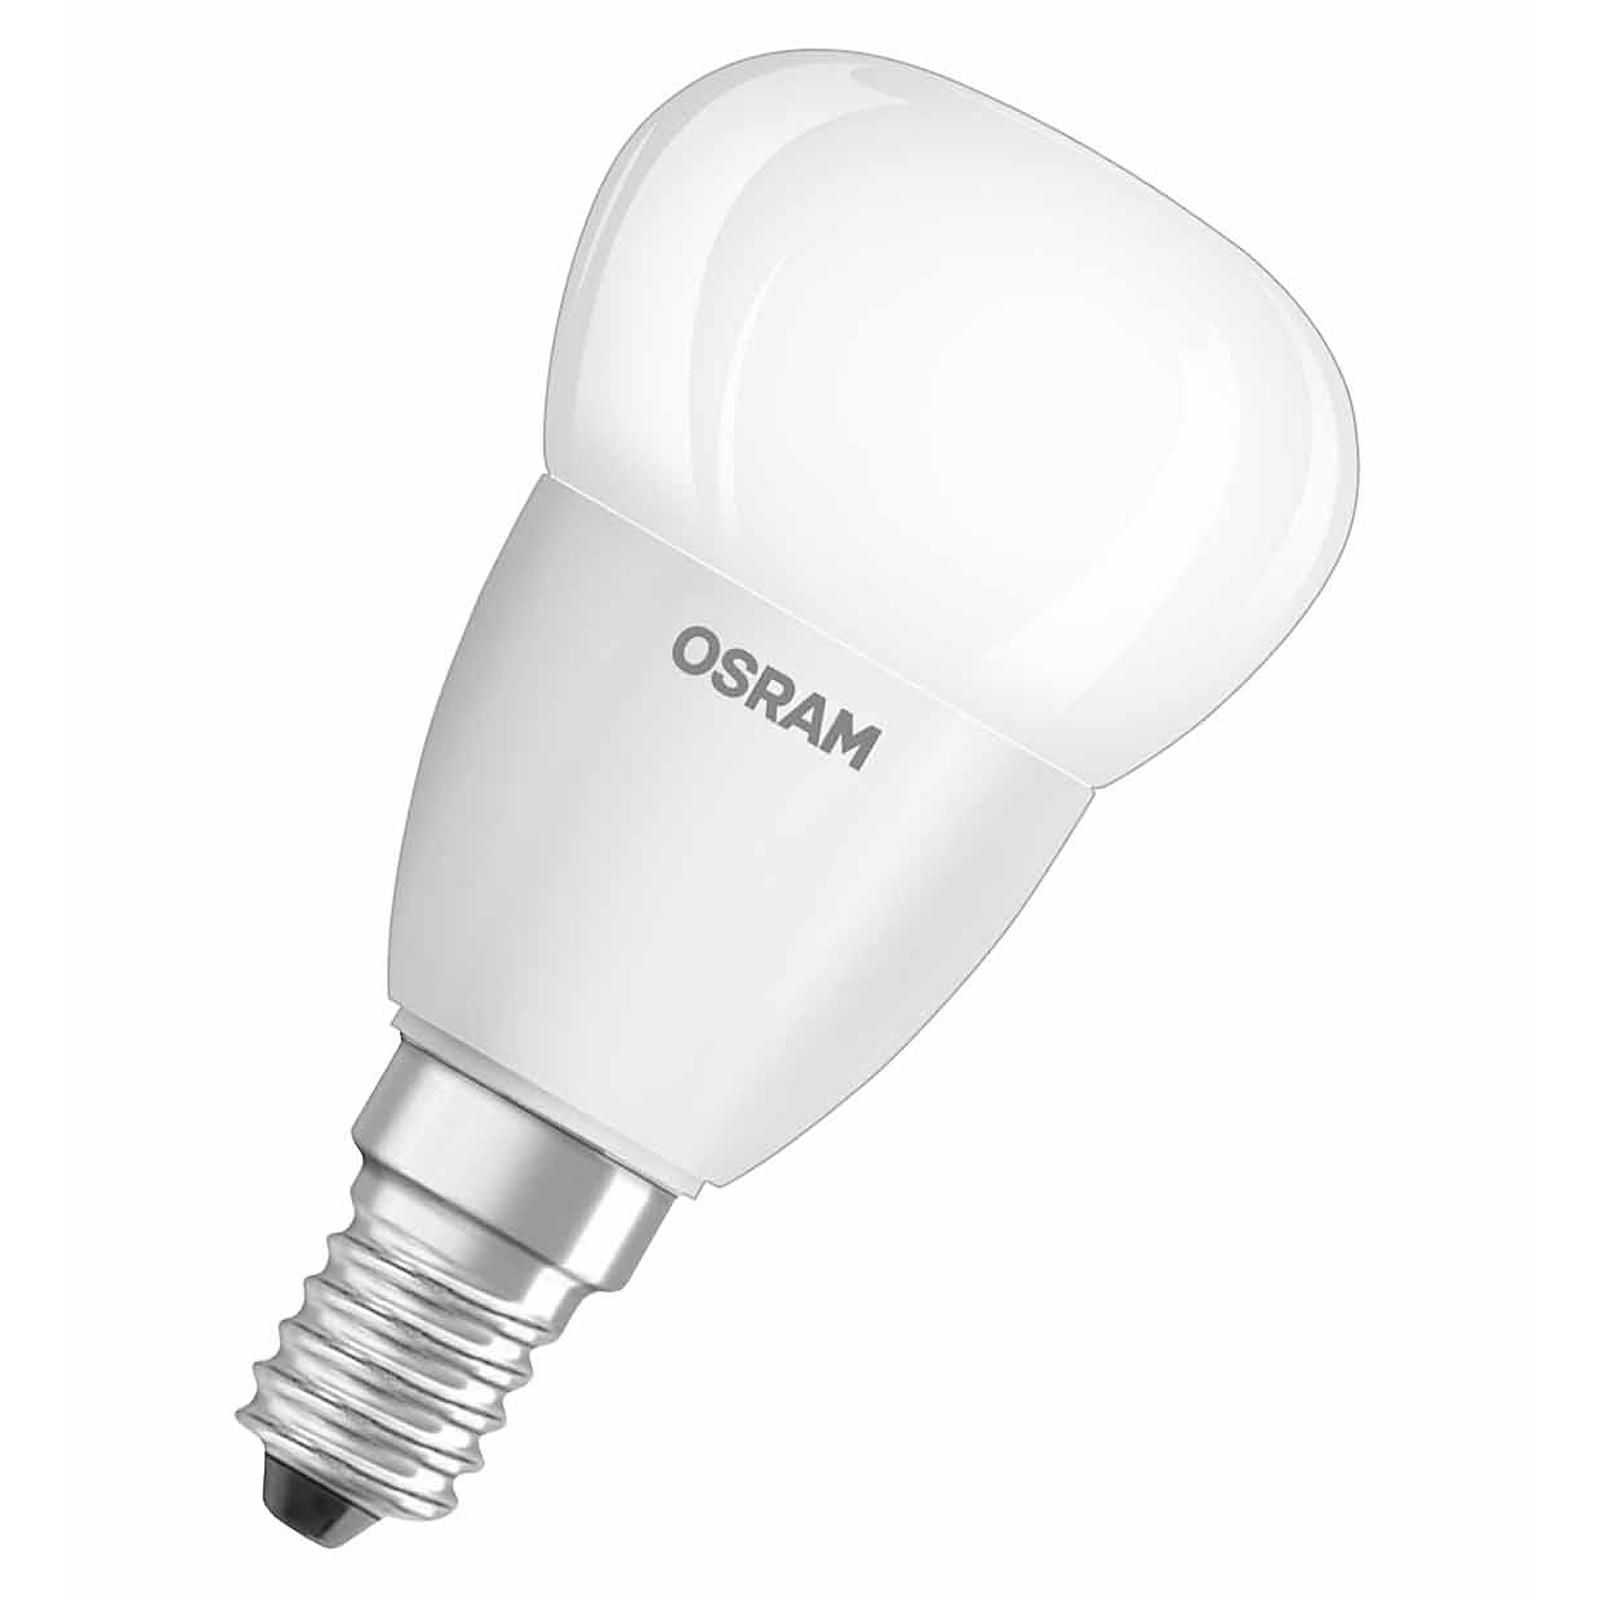 osram led star classic p 40 e14 5 7 watt ersatz f r 40 watt 470 lumen warmwei 4052899911932. Black Bedroom Furniture Sets. Home Design Ideas